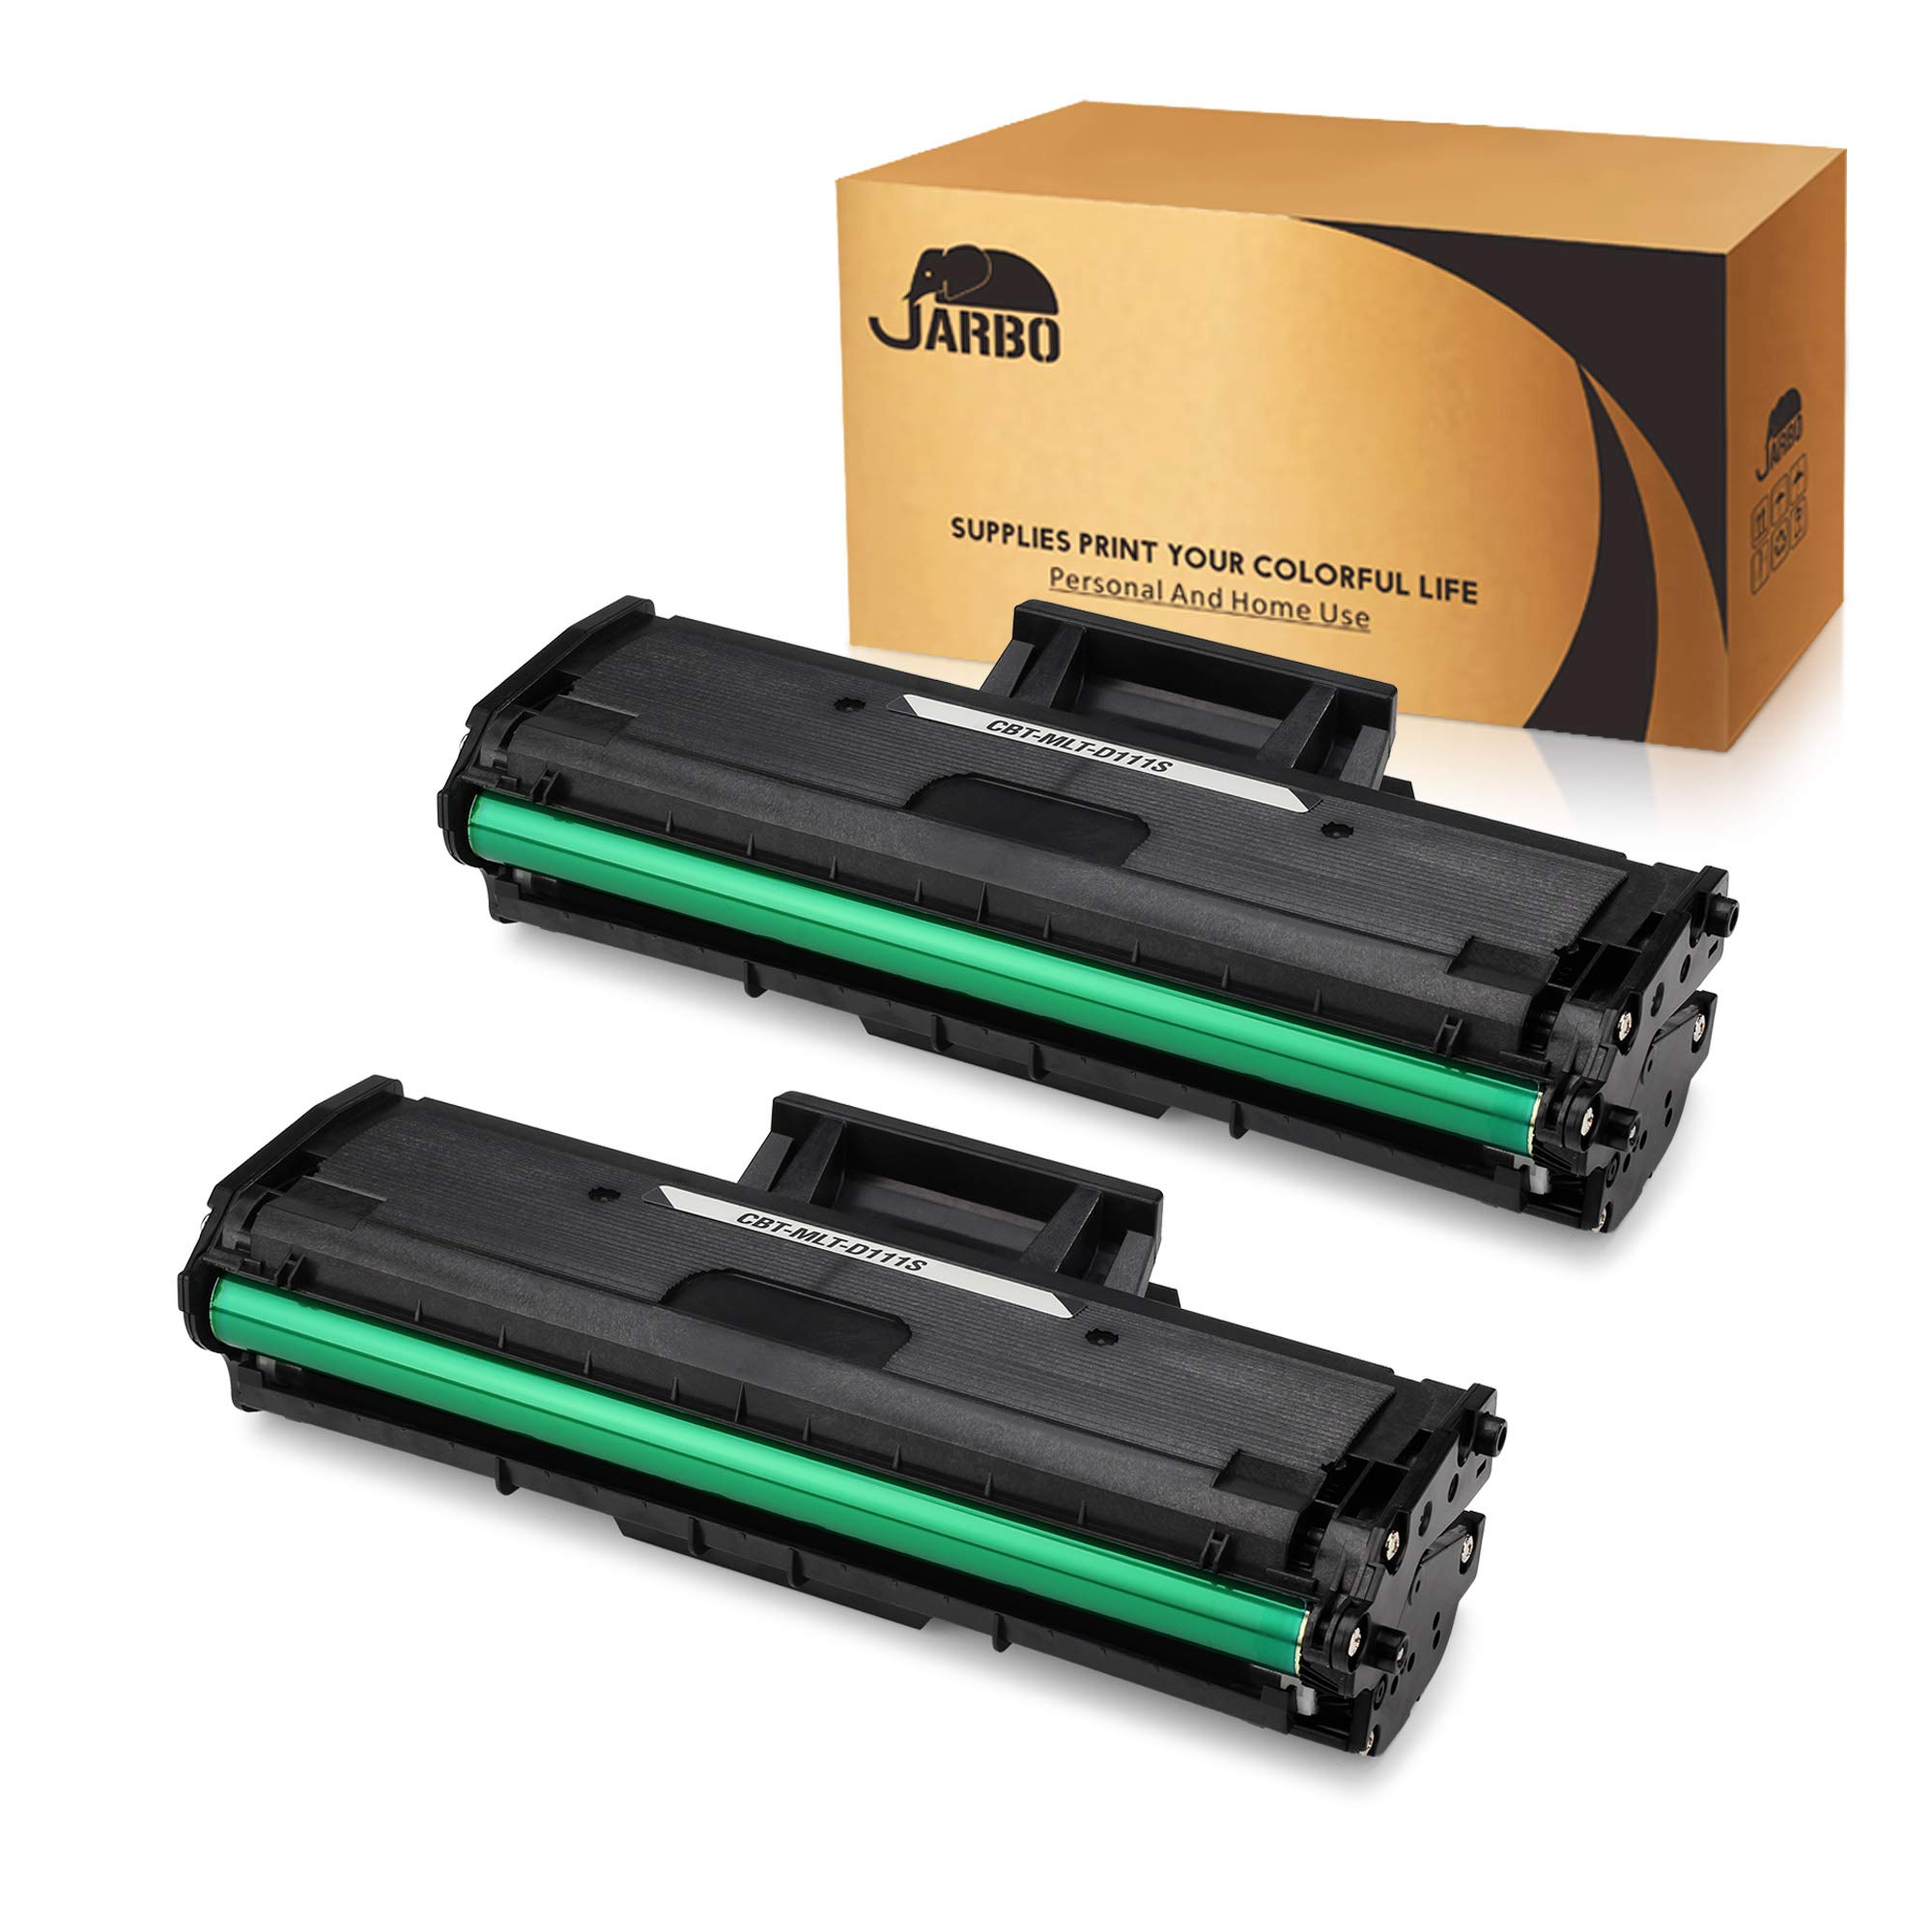 JARBO Compatible Toner Cartridges Replacement for Samsung MLT-D111S MLTD111S, High Yield, 2 Black, Compatible with Samsung Xpress M2020W, Samsung Xpress M2070FW, Samsung Xpress M2070W Laser Printer